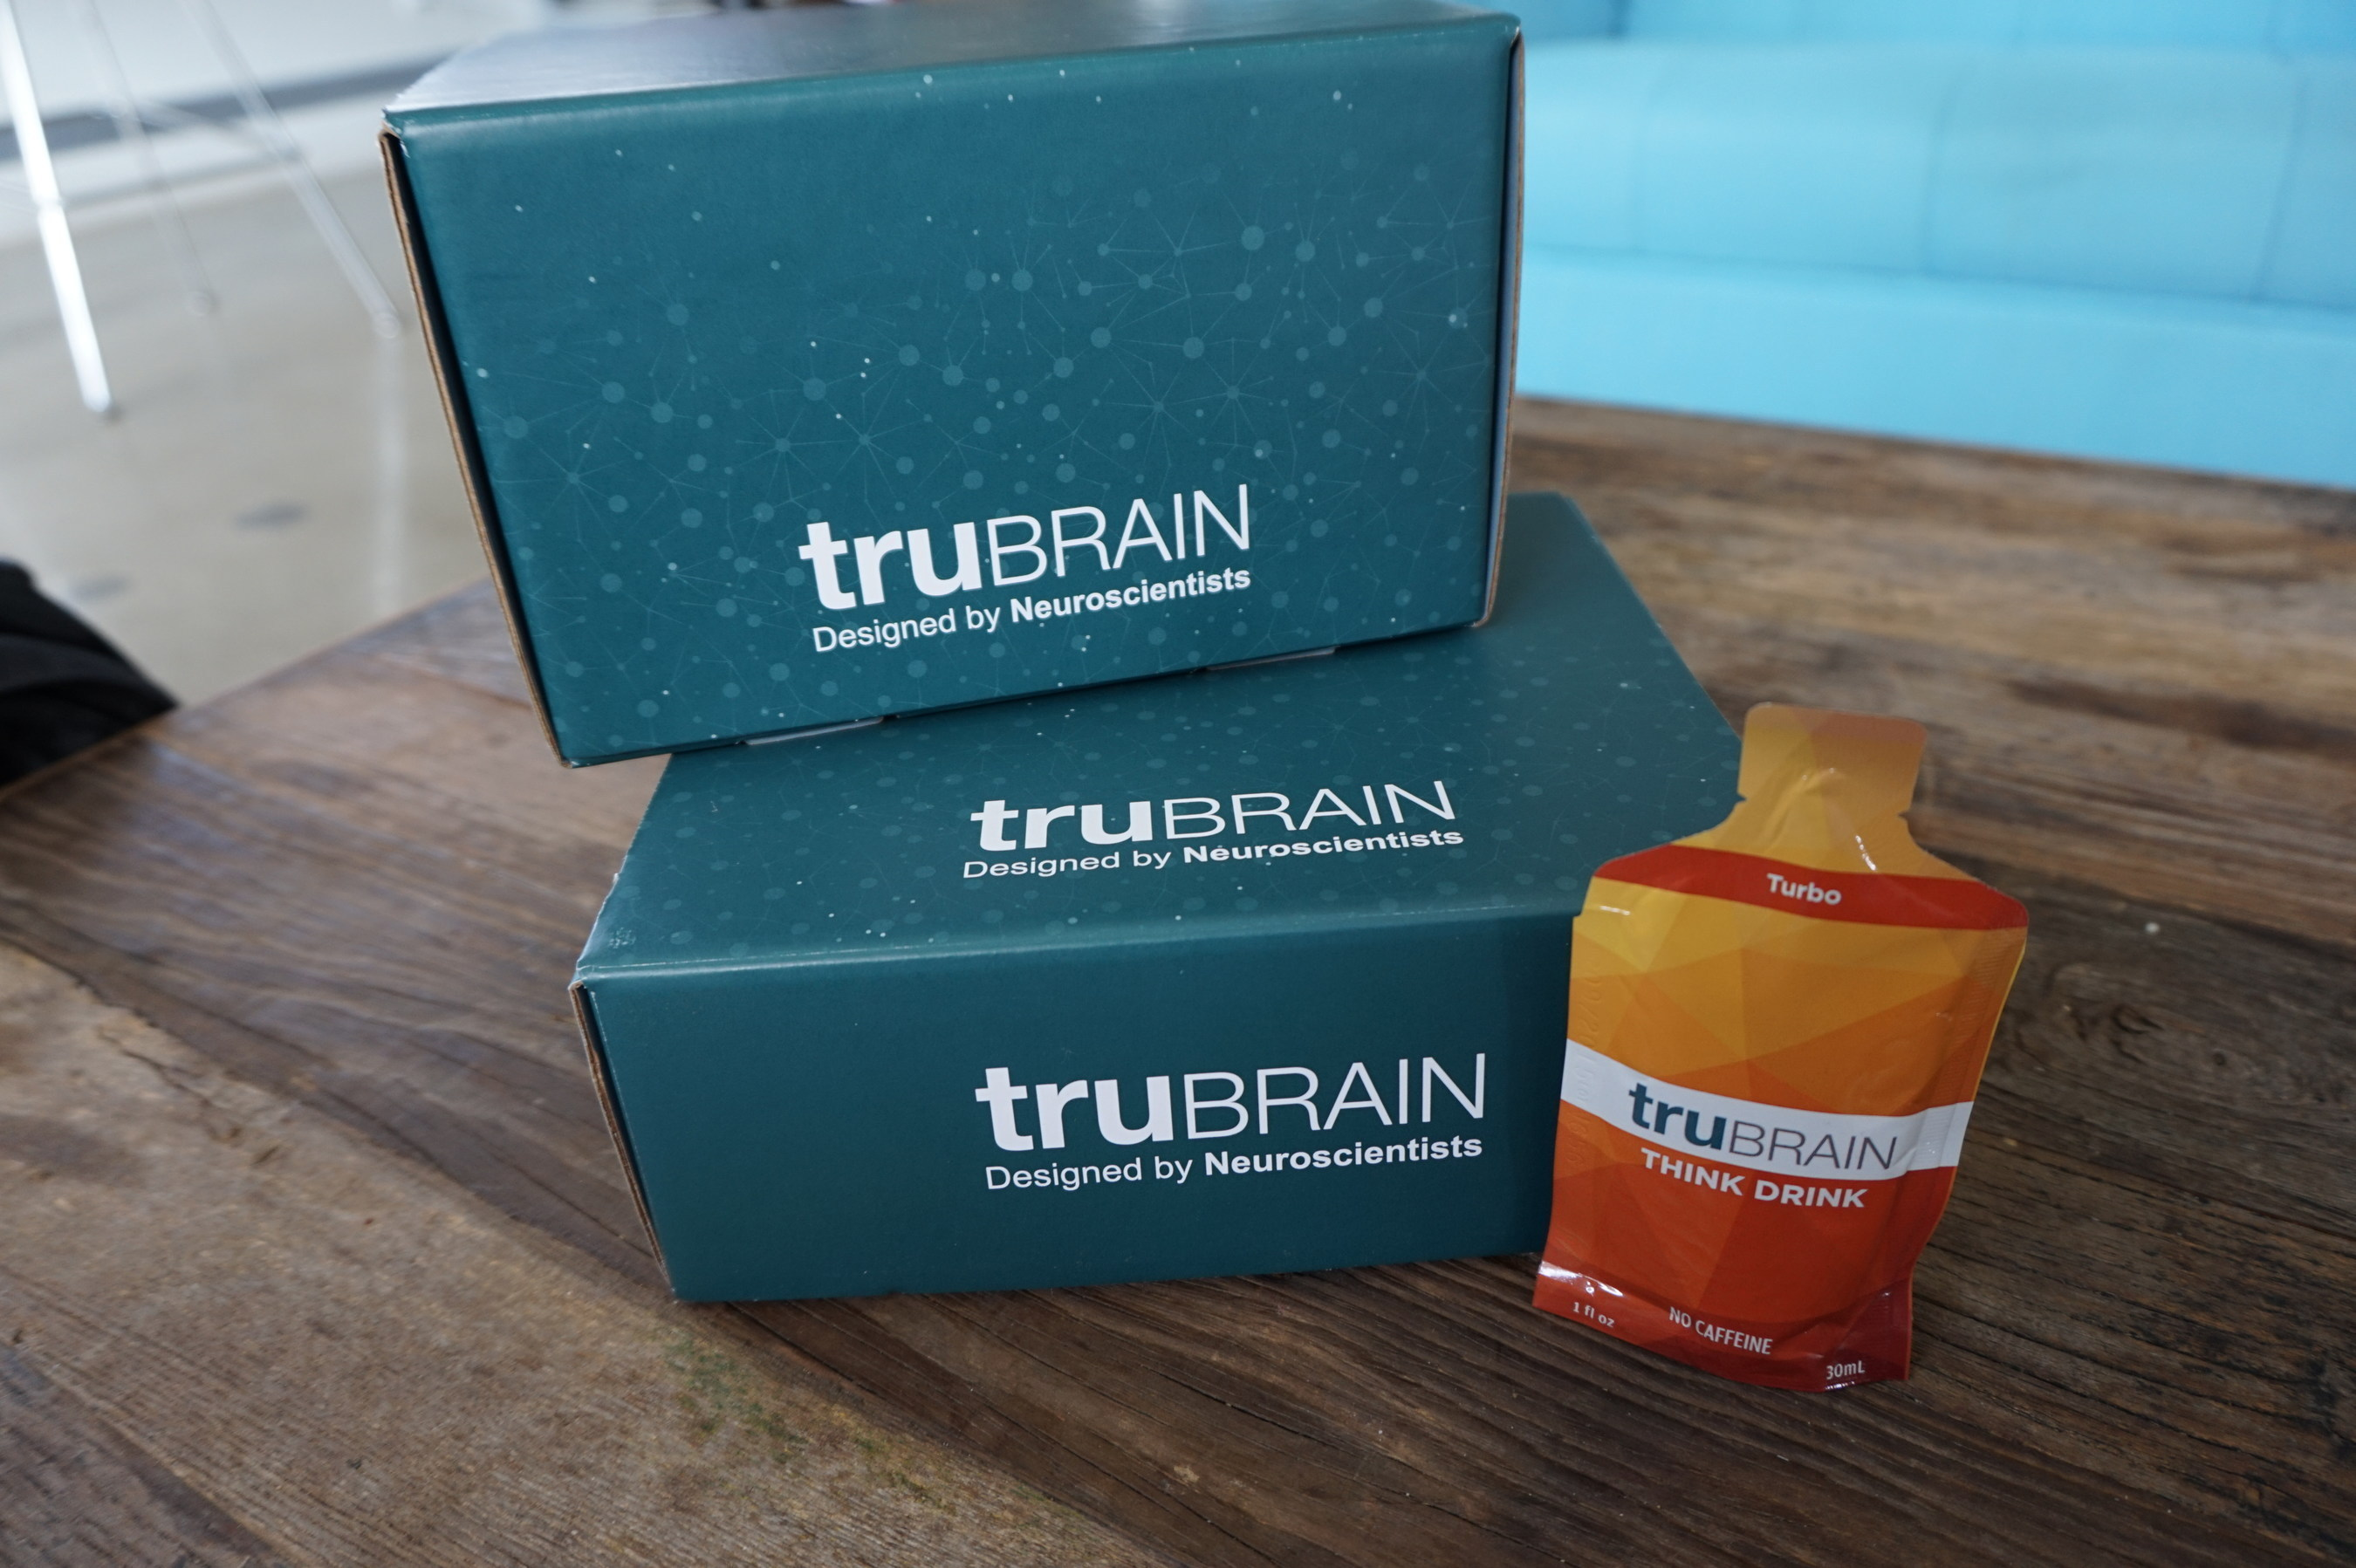 Neuroscience start-up, TruBrain, is defining the emerging